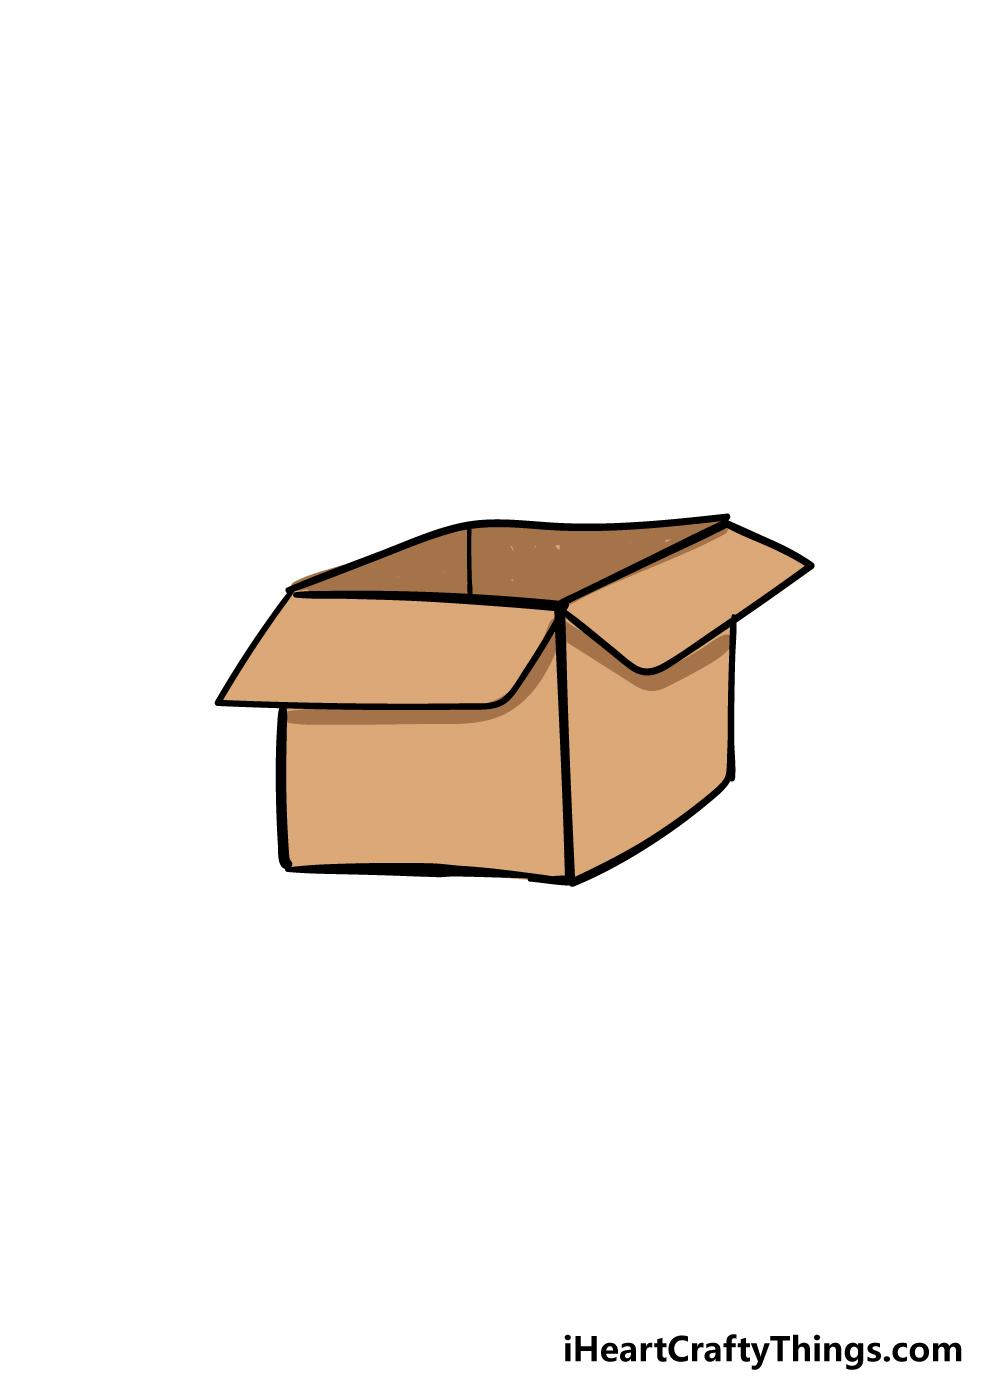 box drawing step 6